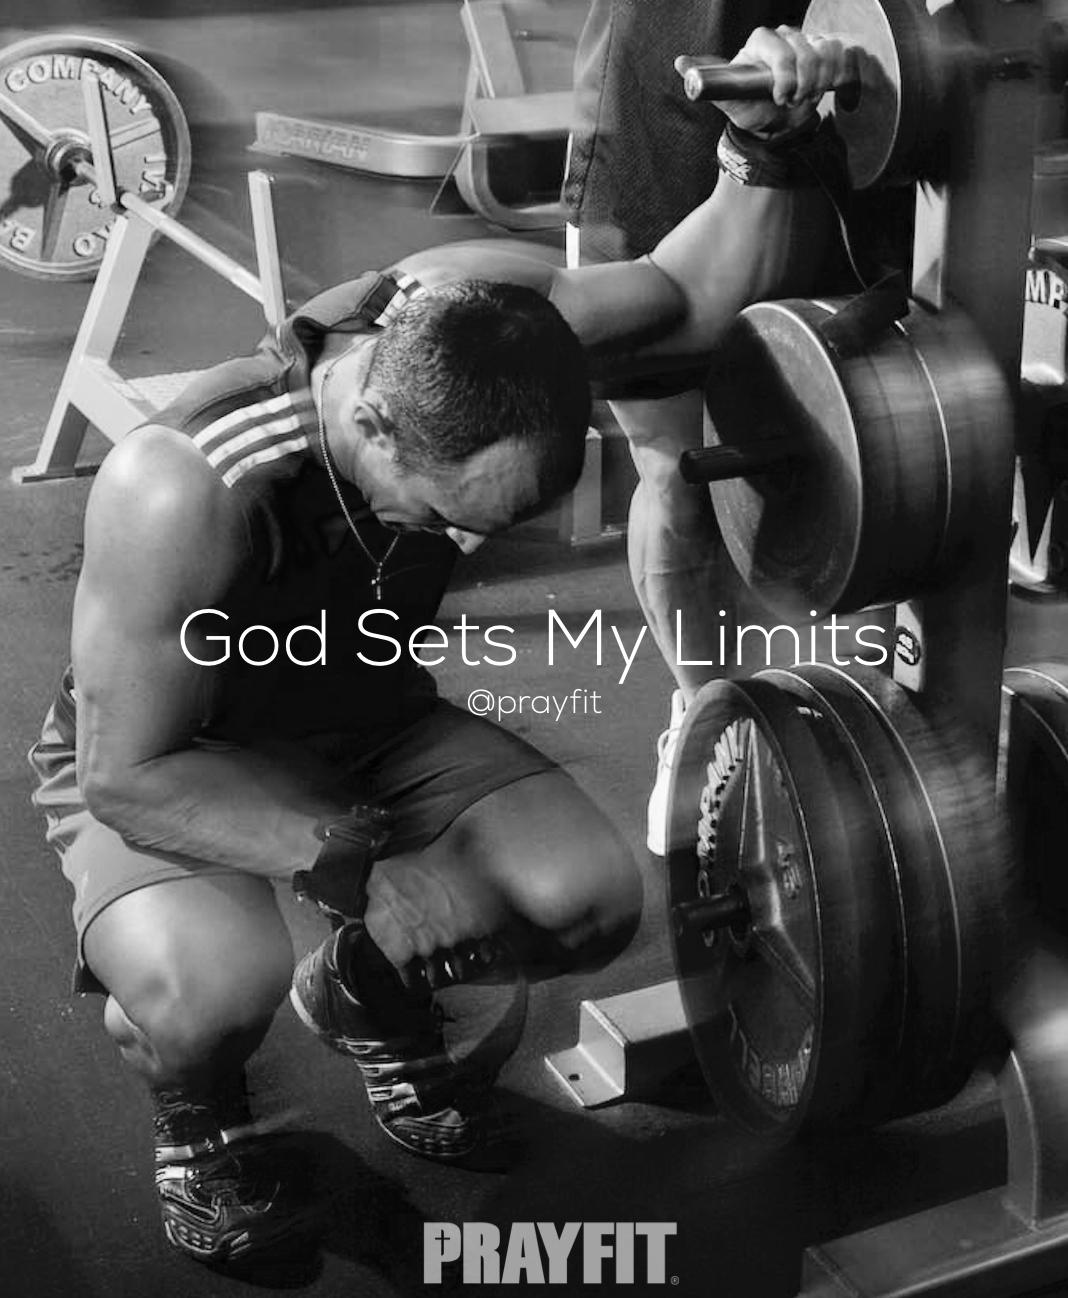 God sets my limits 2.jpeg